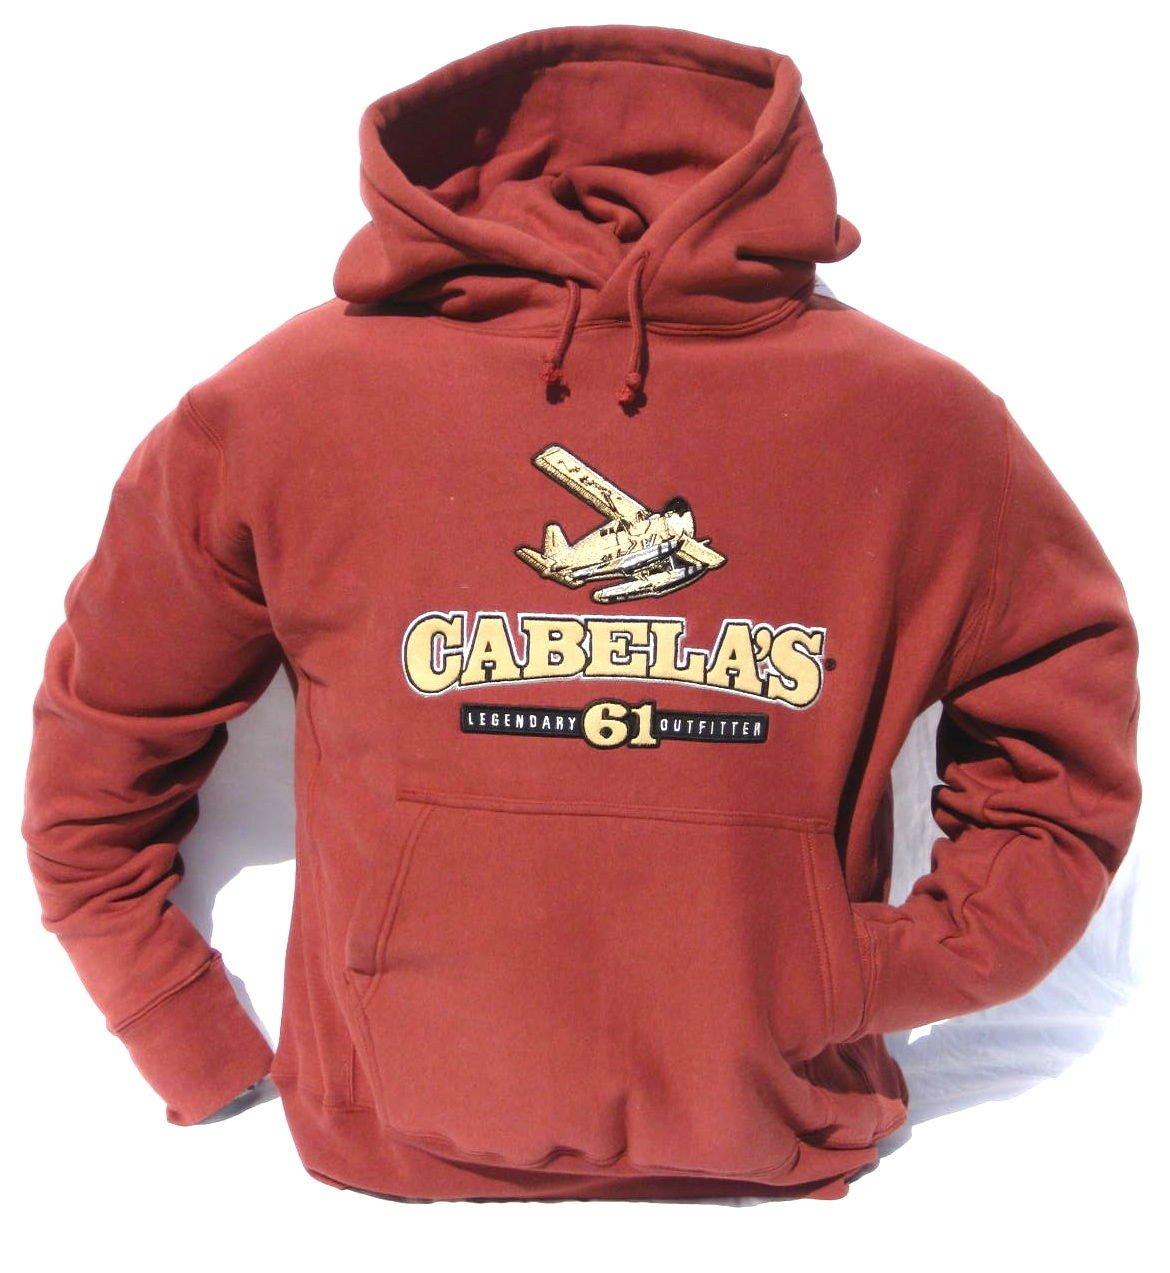 de316a041a082 Amazon.com : Cabela's Deer, Lab, Duck, Float Plane HeavyWeight Hunting  Hoodie : Clothing